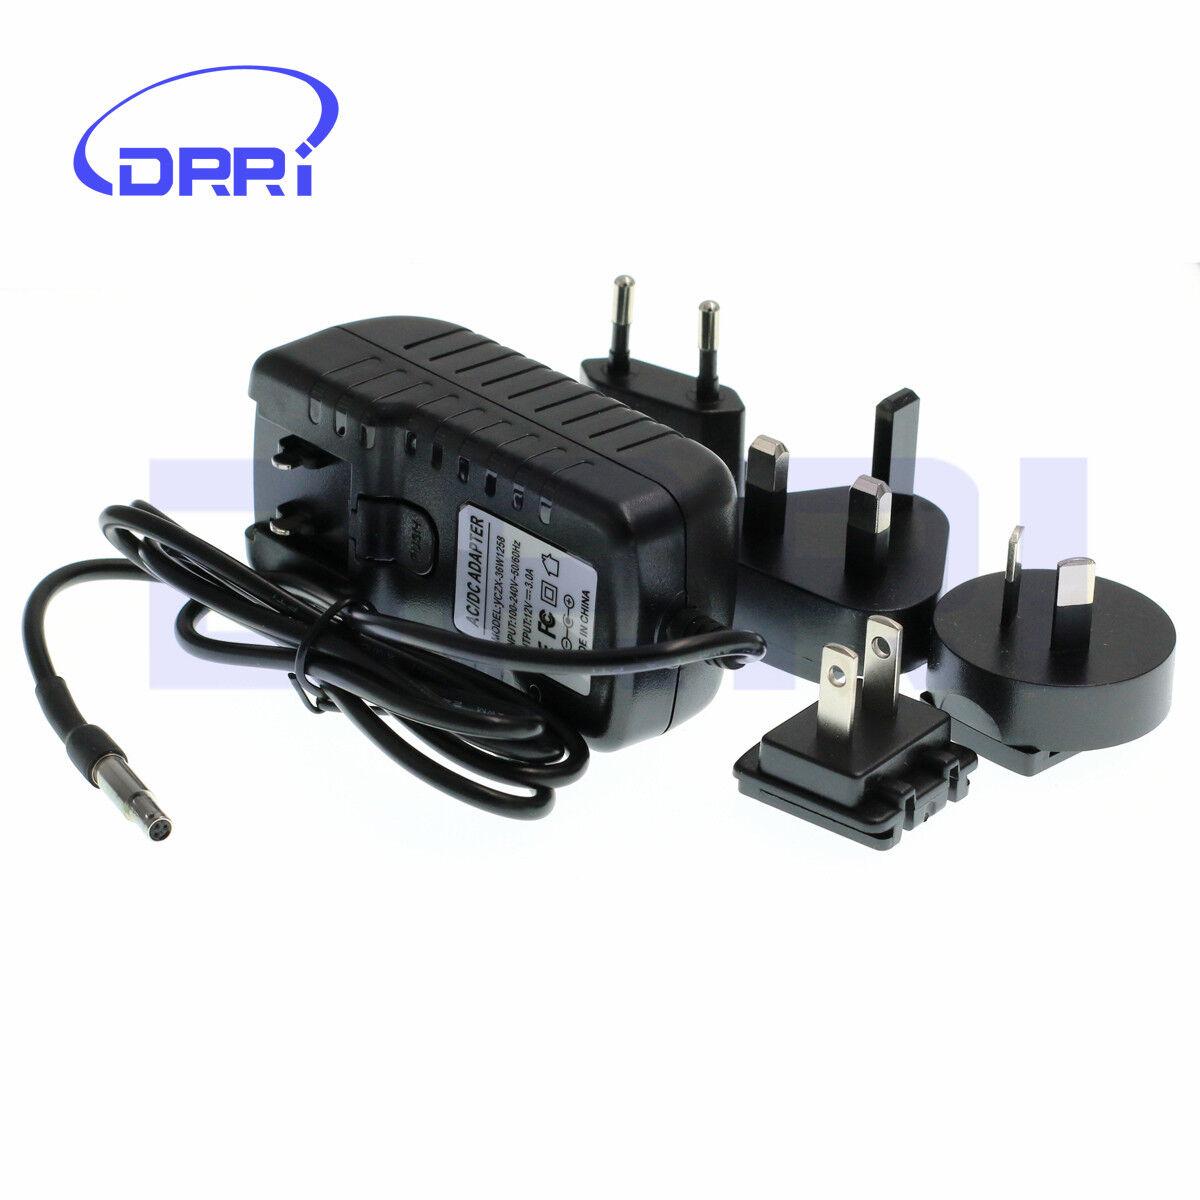 Universal AC Power Supply Adapter with US UK EU AU Plug for Odyssey